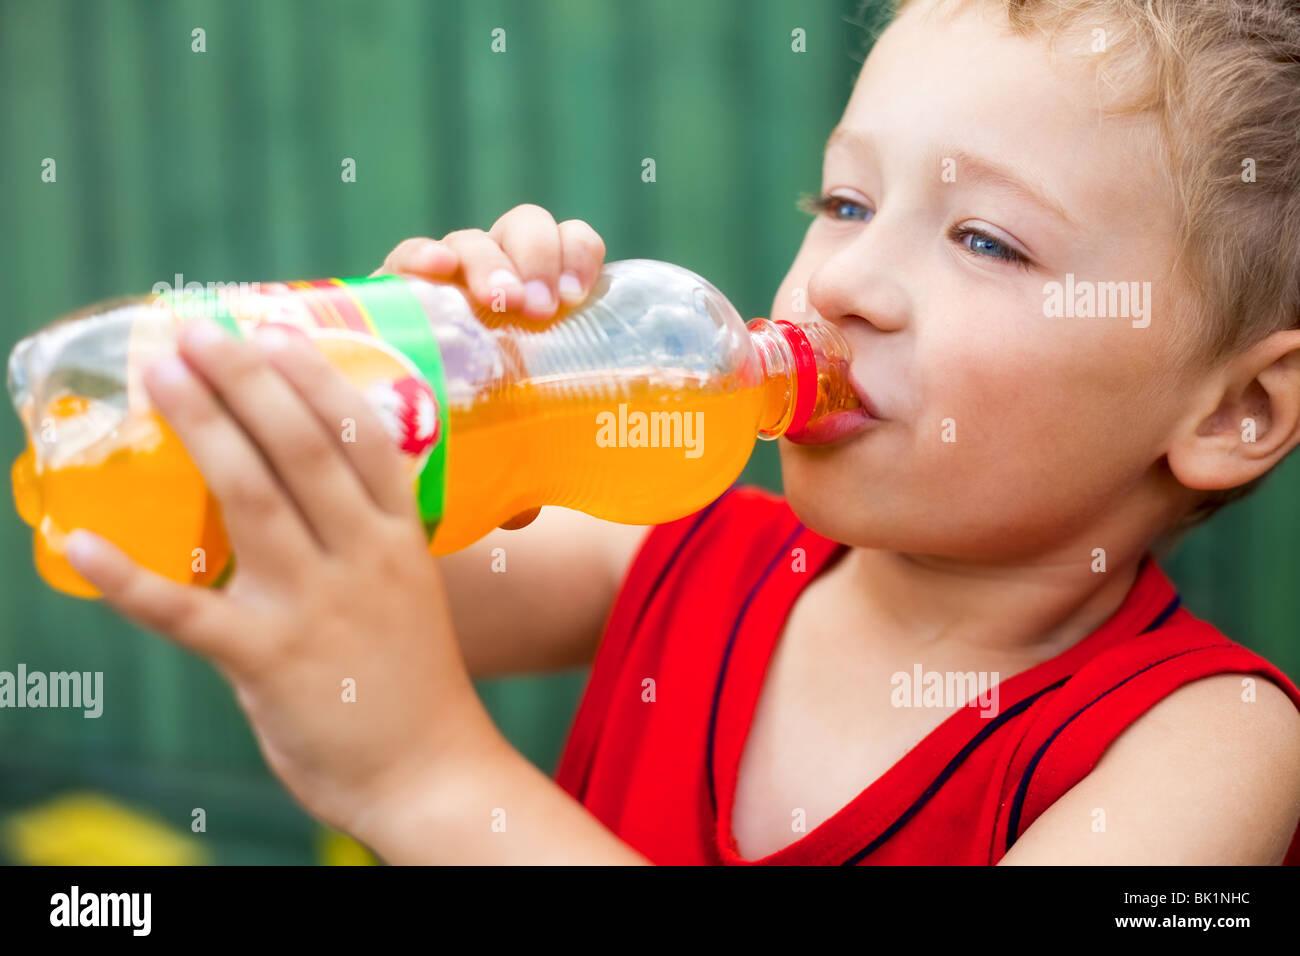 Little boy drinking unhealthy bottled soda - Stock Image